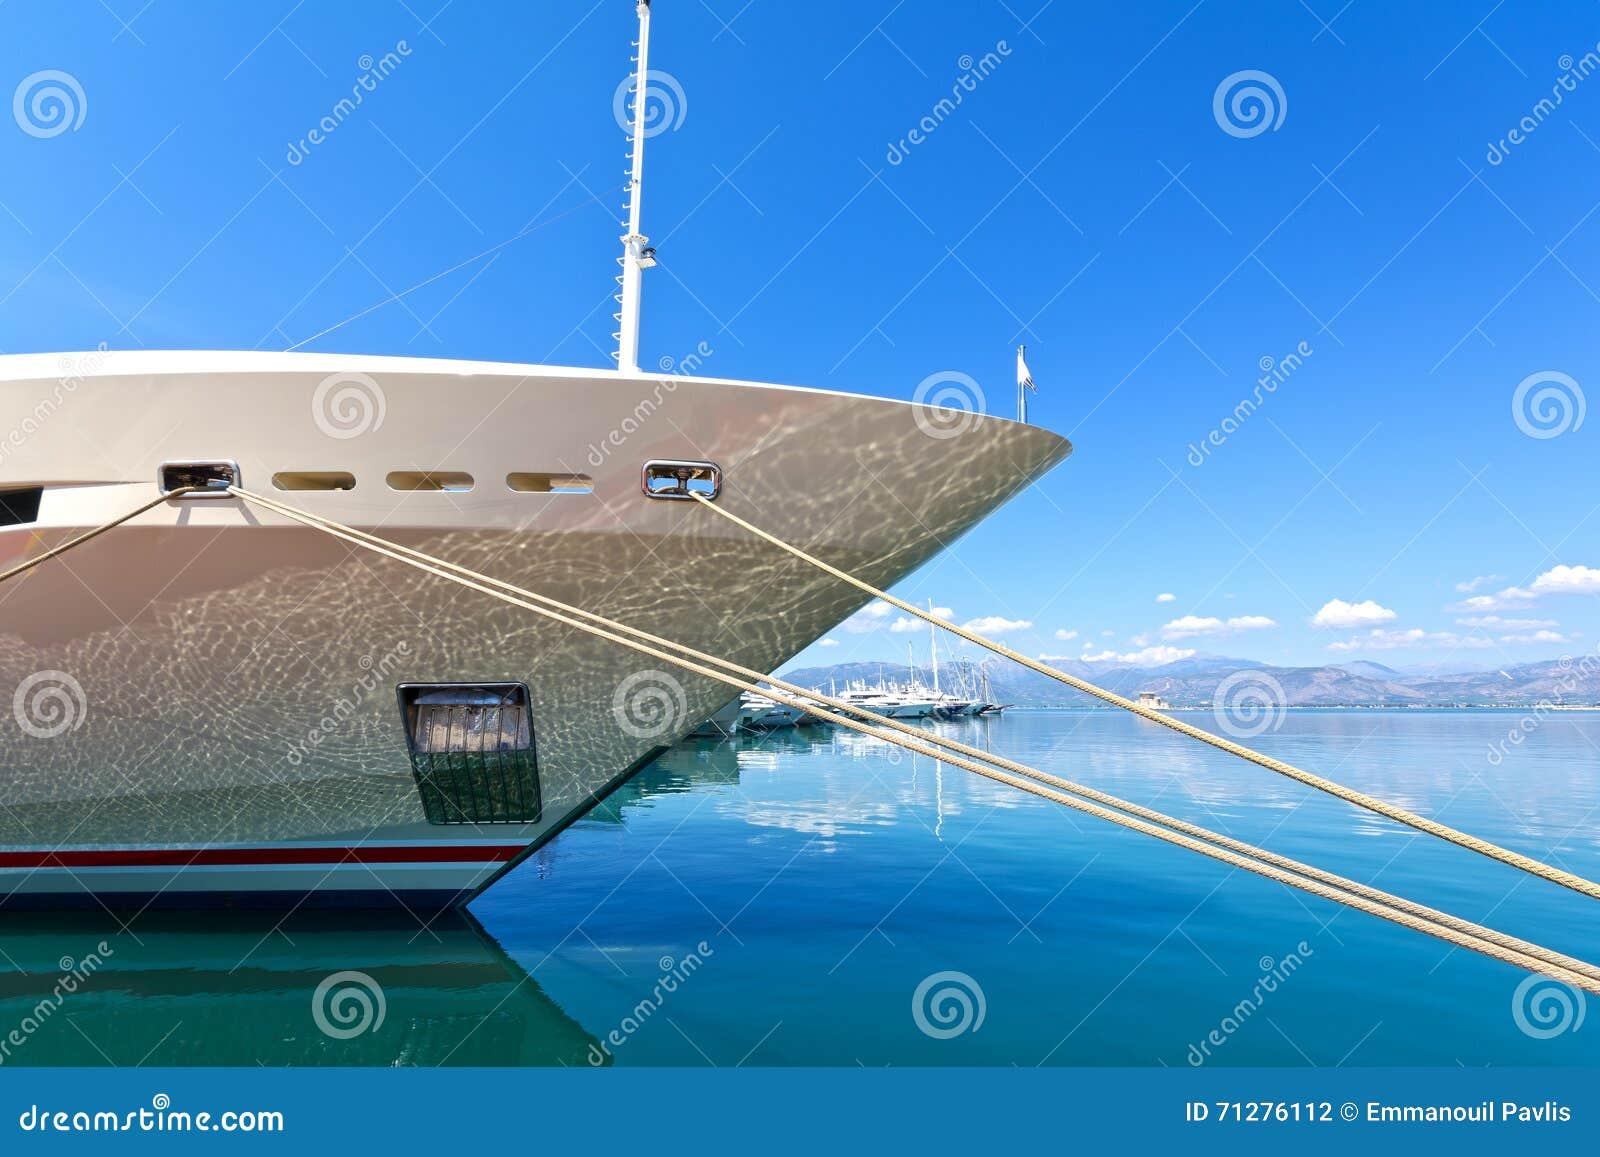 Роскошная мега-яхта